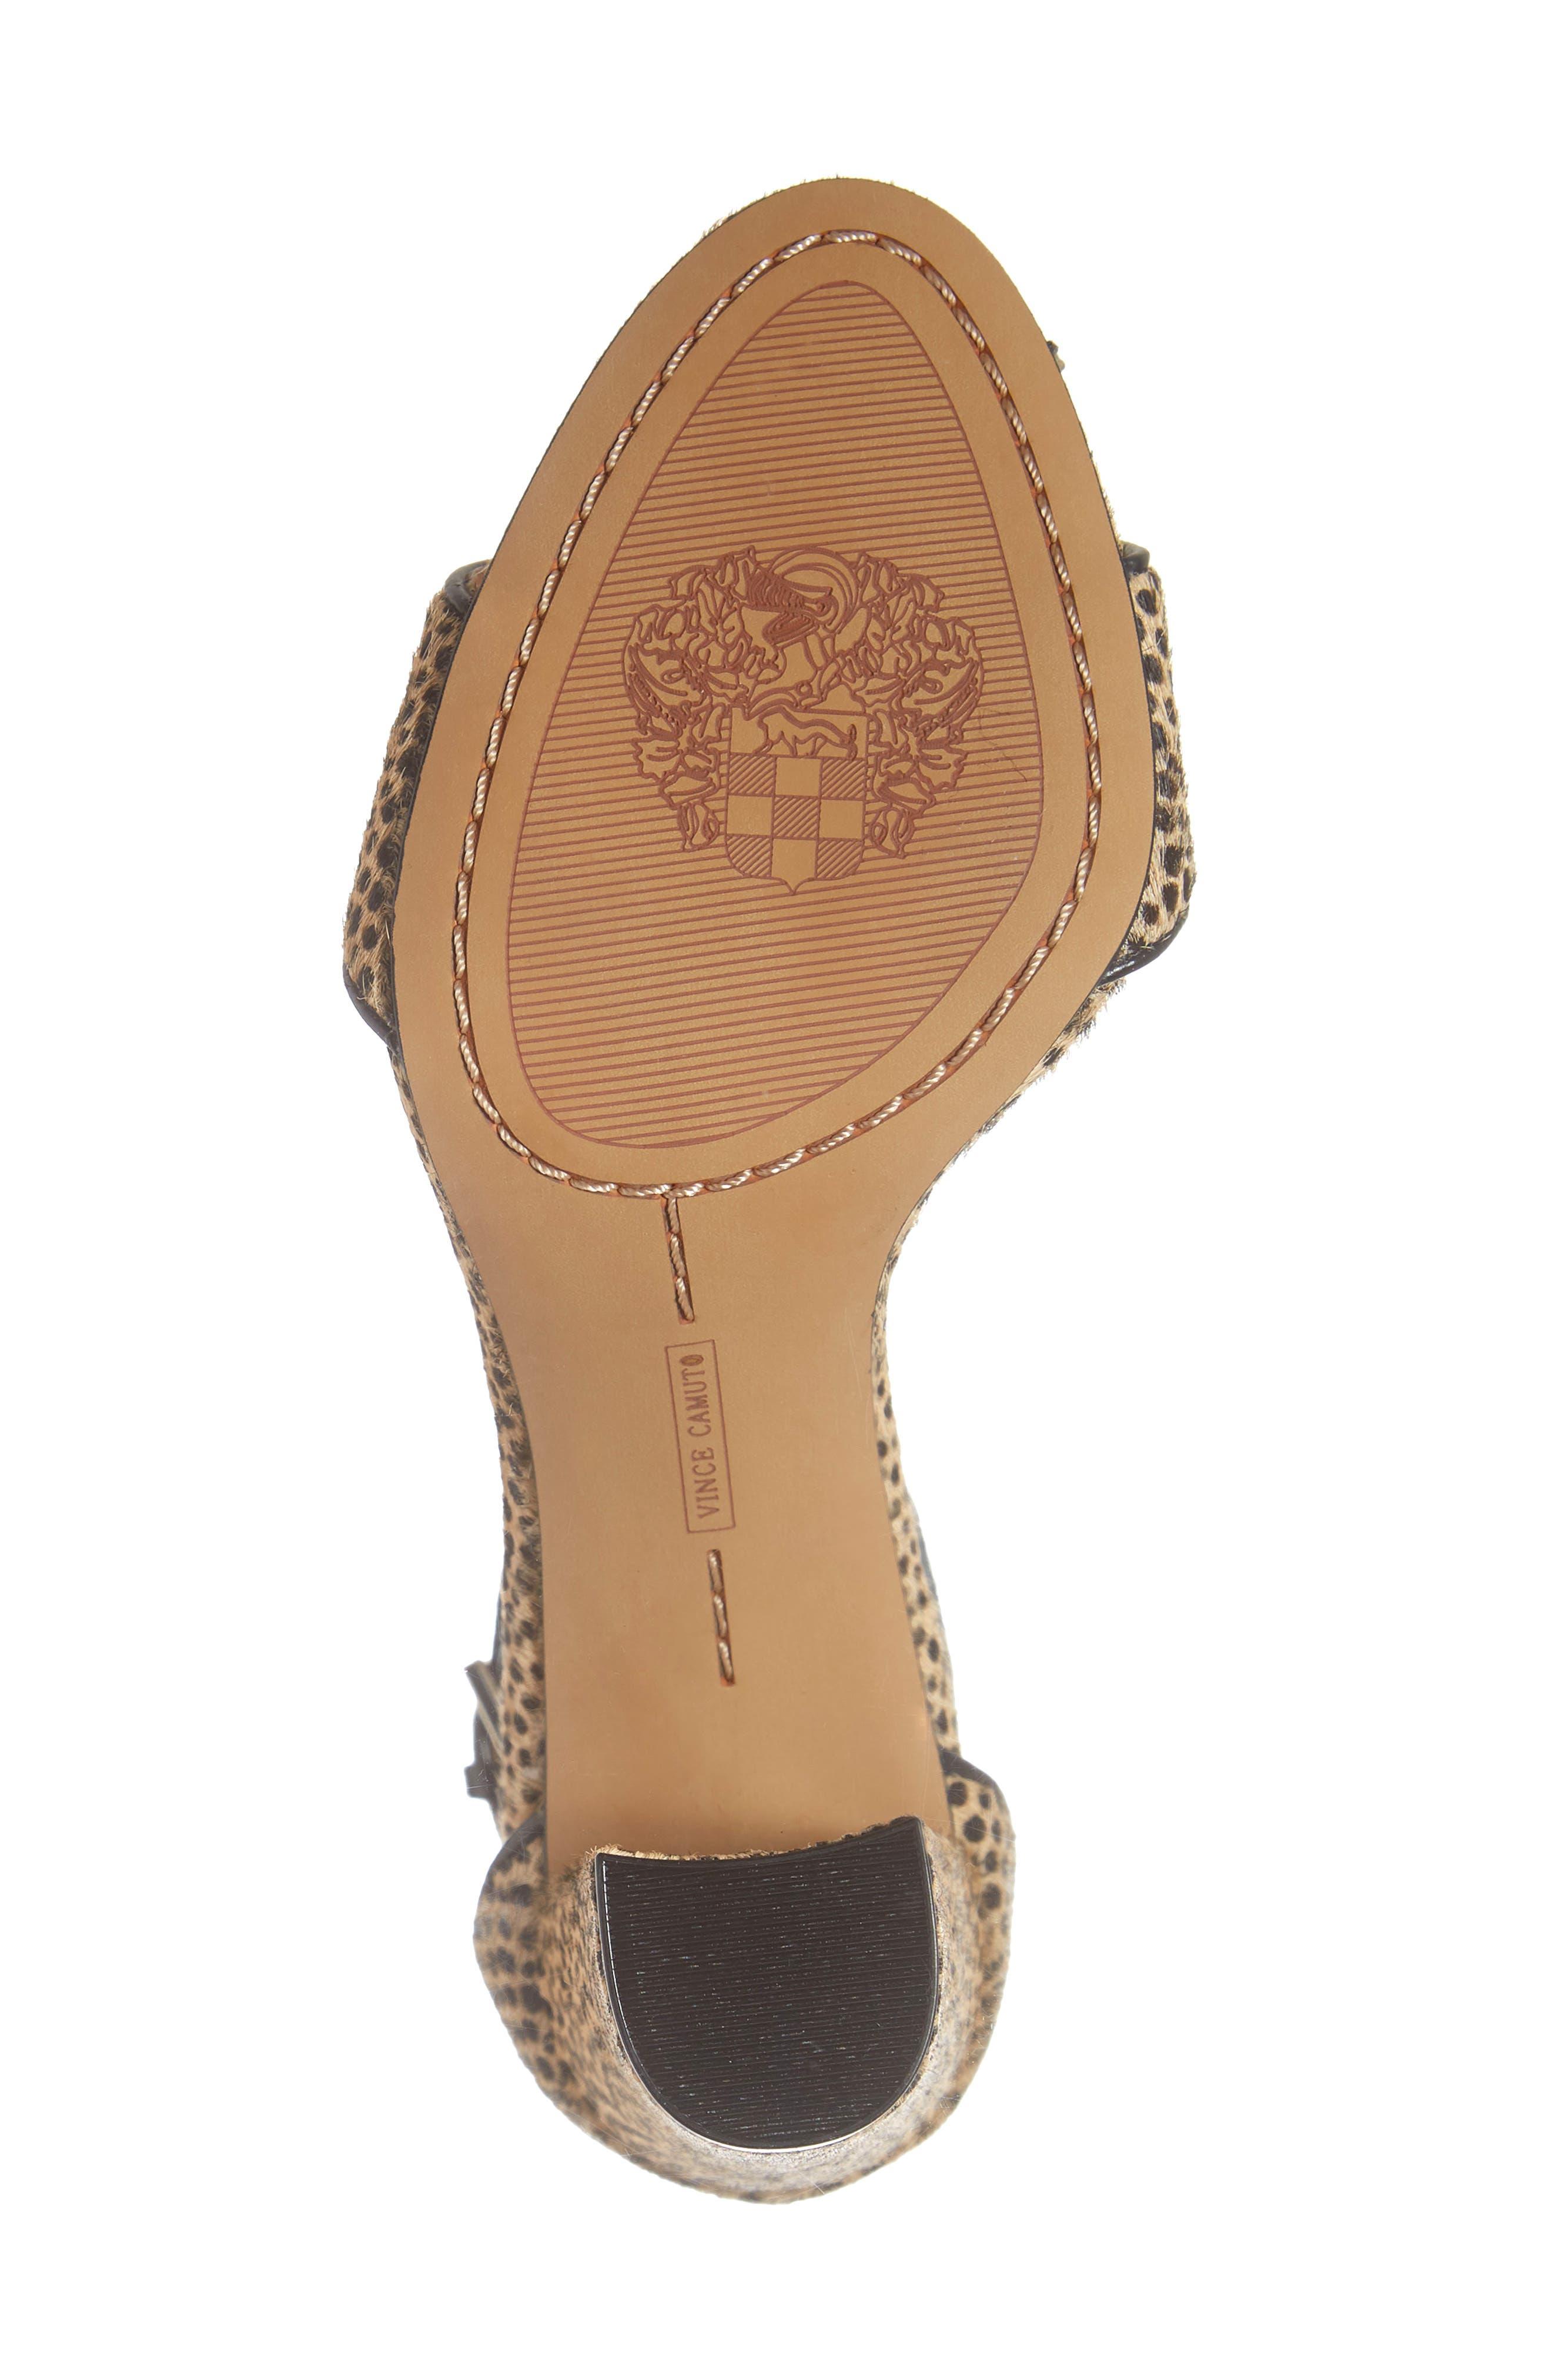 Corlina Genuine Calf Hair Ankle Strap Sandal,                             Alternate thumbnail 6, color,                             NATURAL SPOTTED CALF HAIR